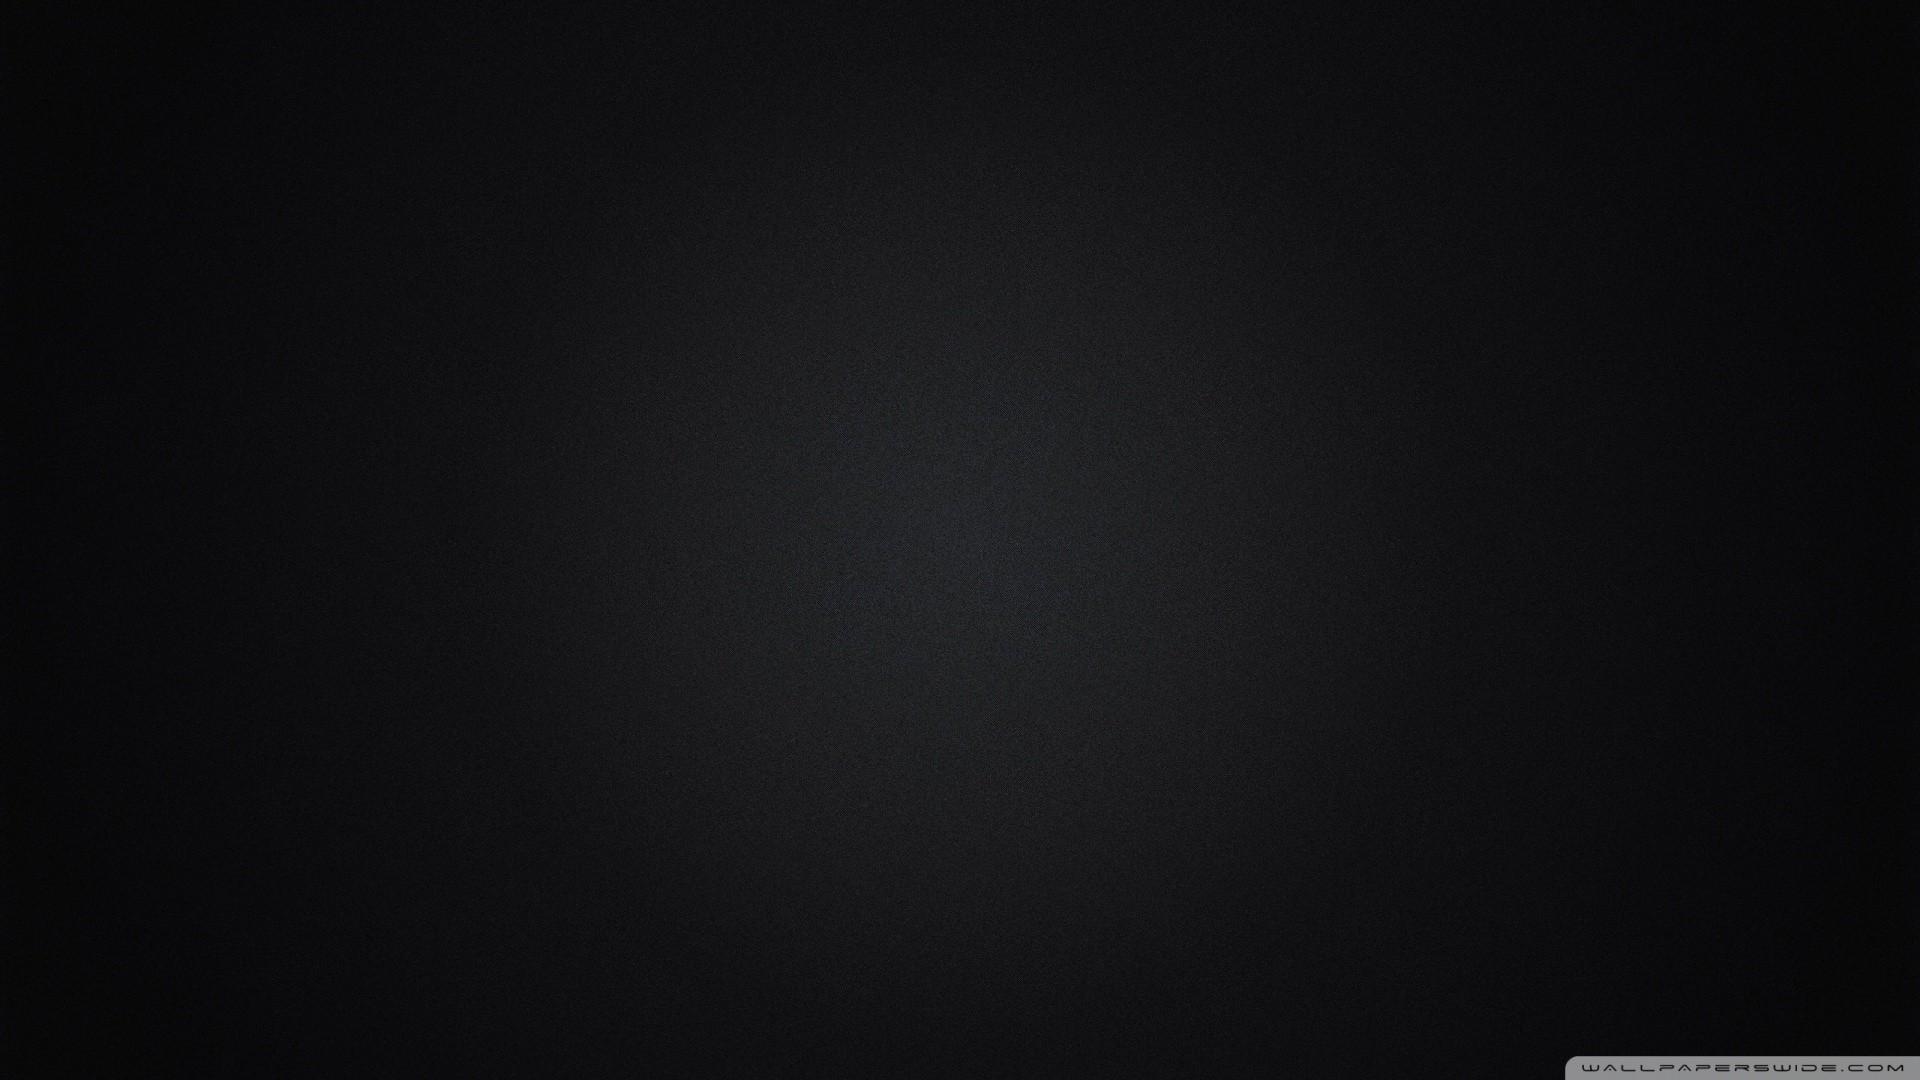 Full Black Wallpaper 83 Pictures